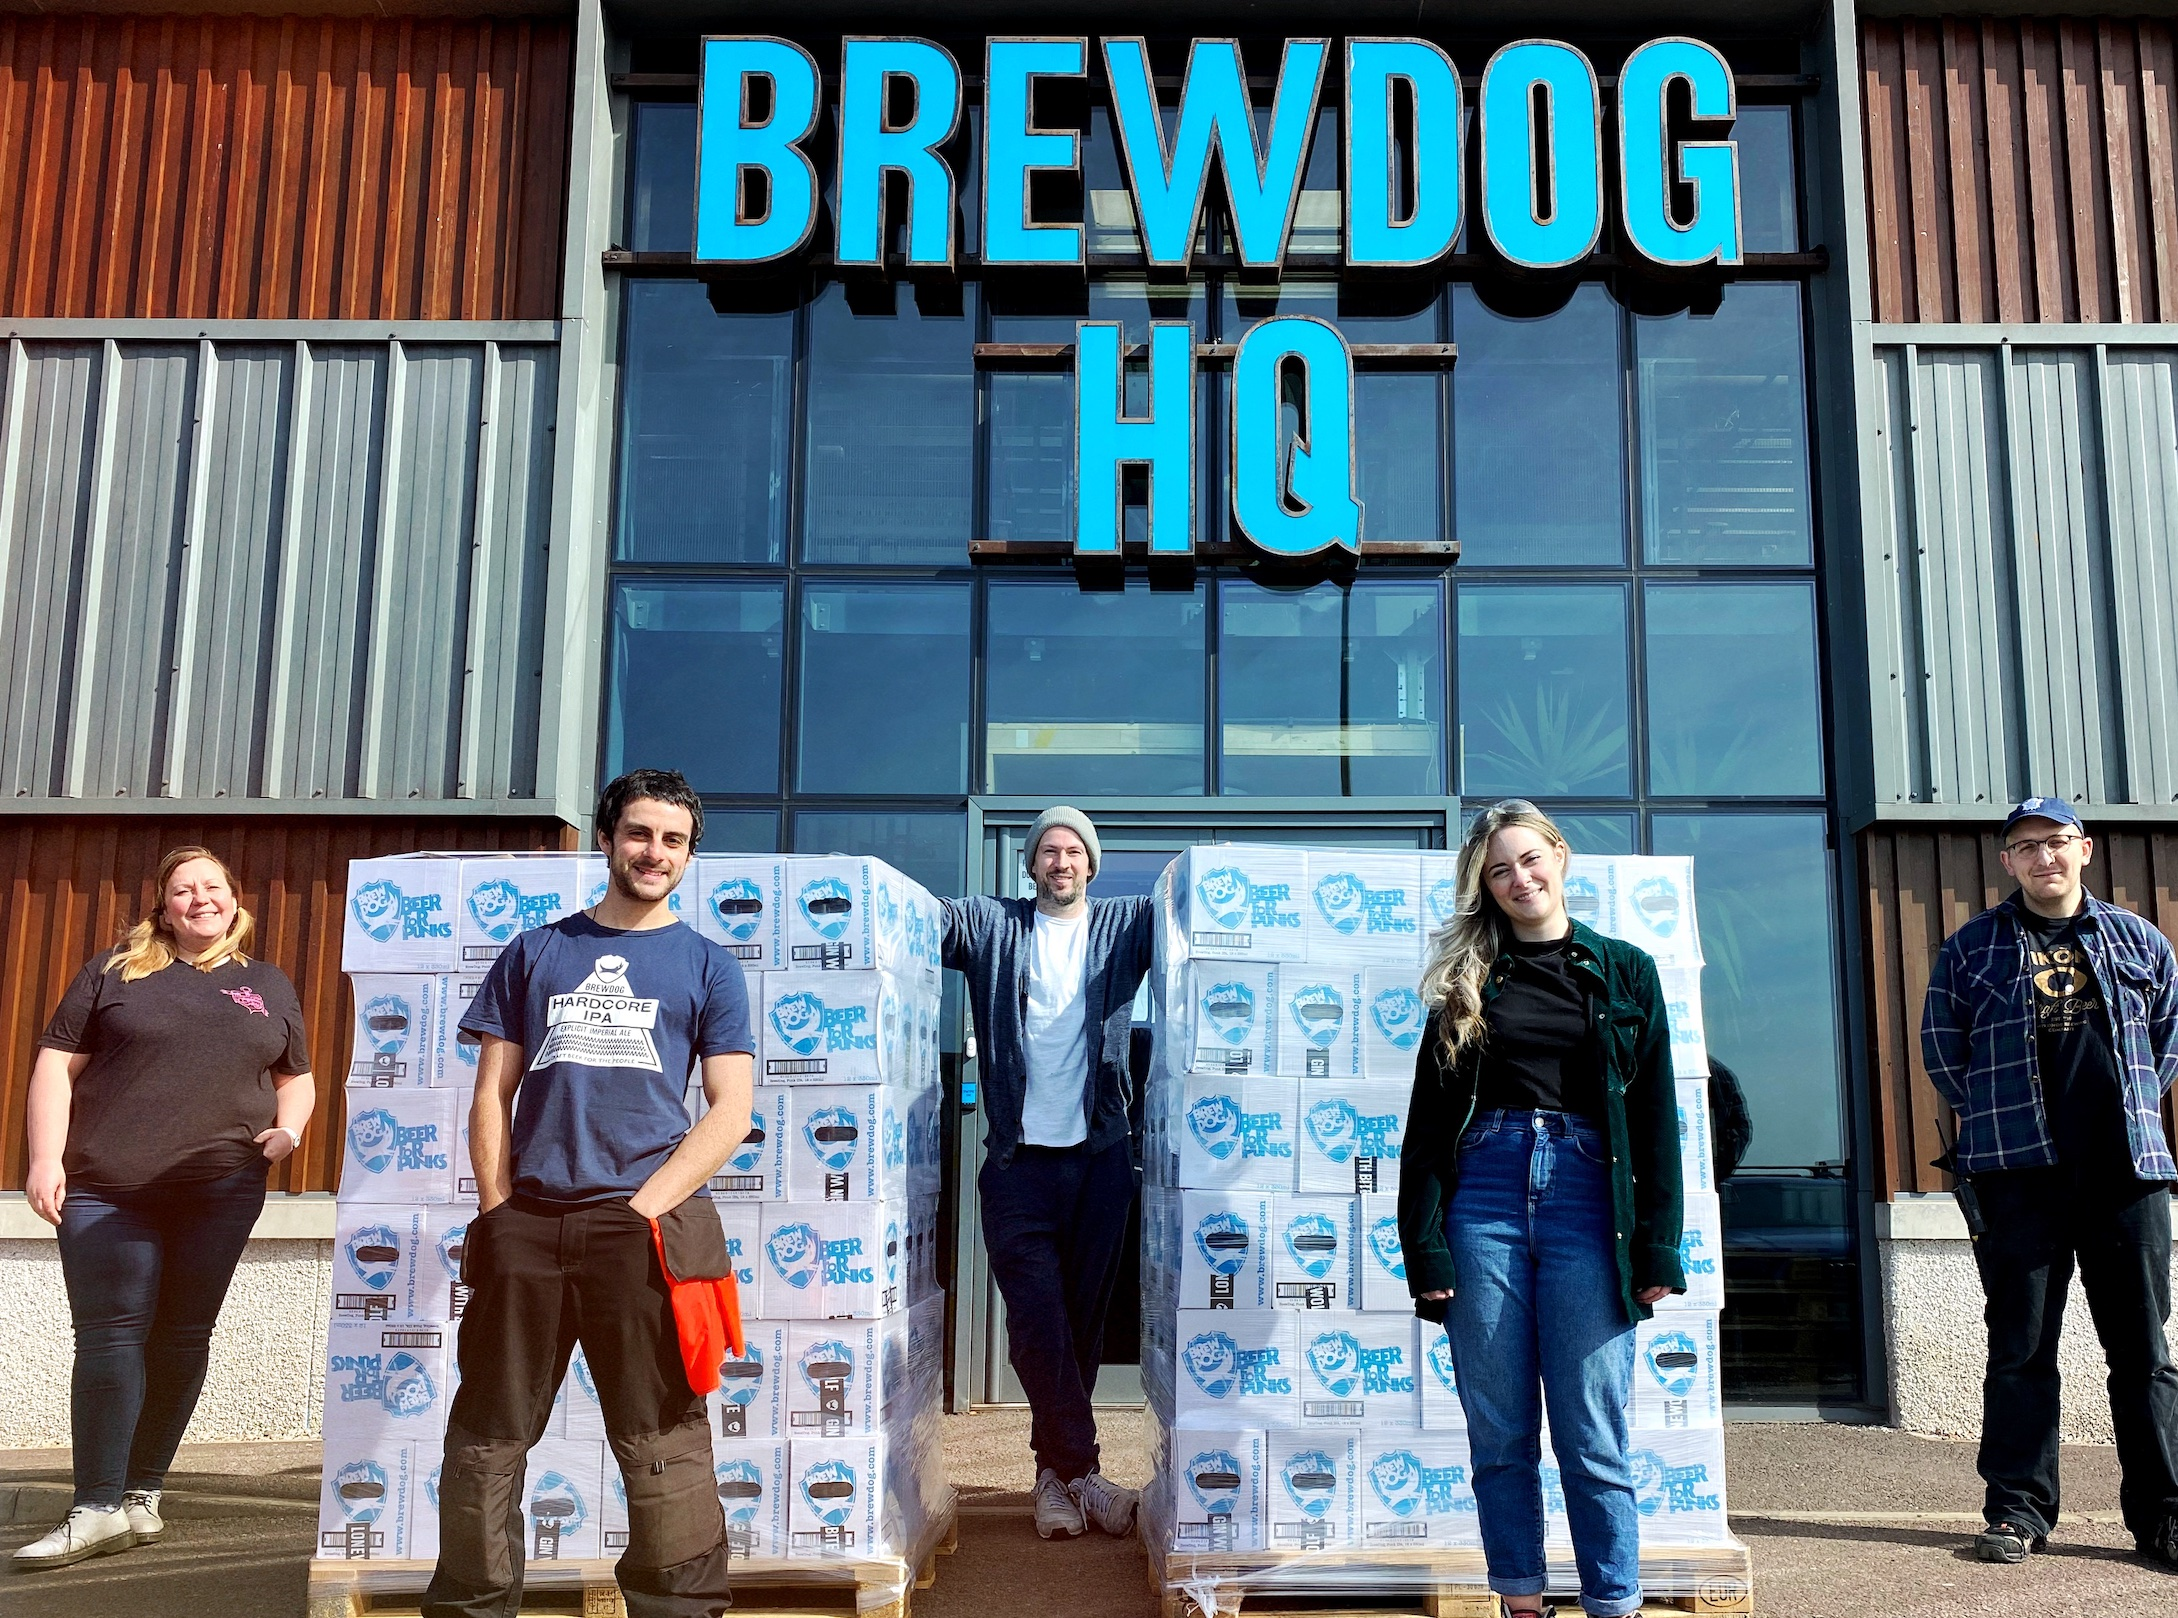 BrewDog has handed out more than 110,000 bottles of hand sanitiser